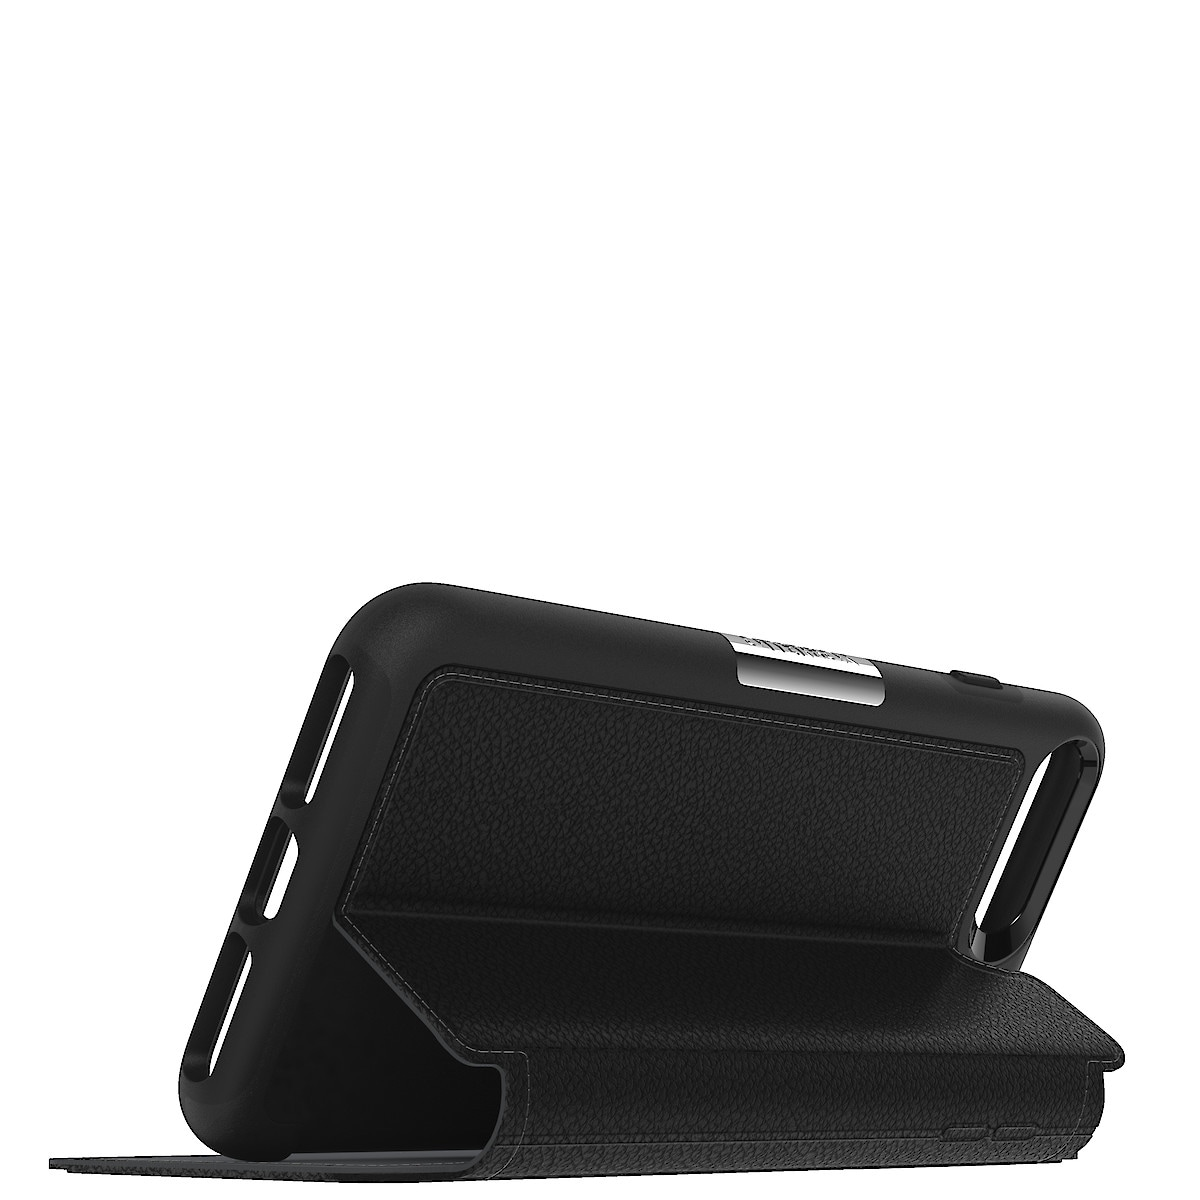 Skyddsskal för iPhone 7 Plus, Otterbox Strada